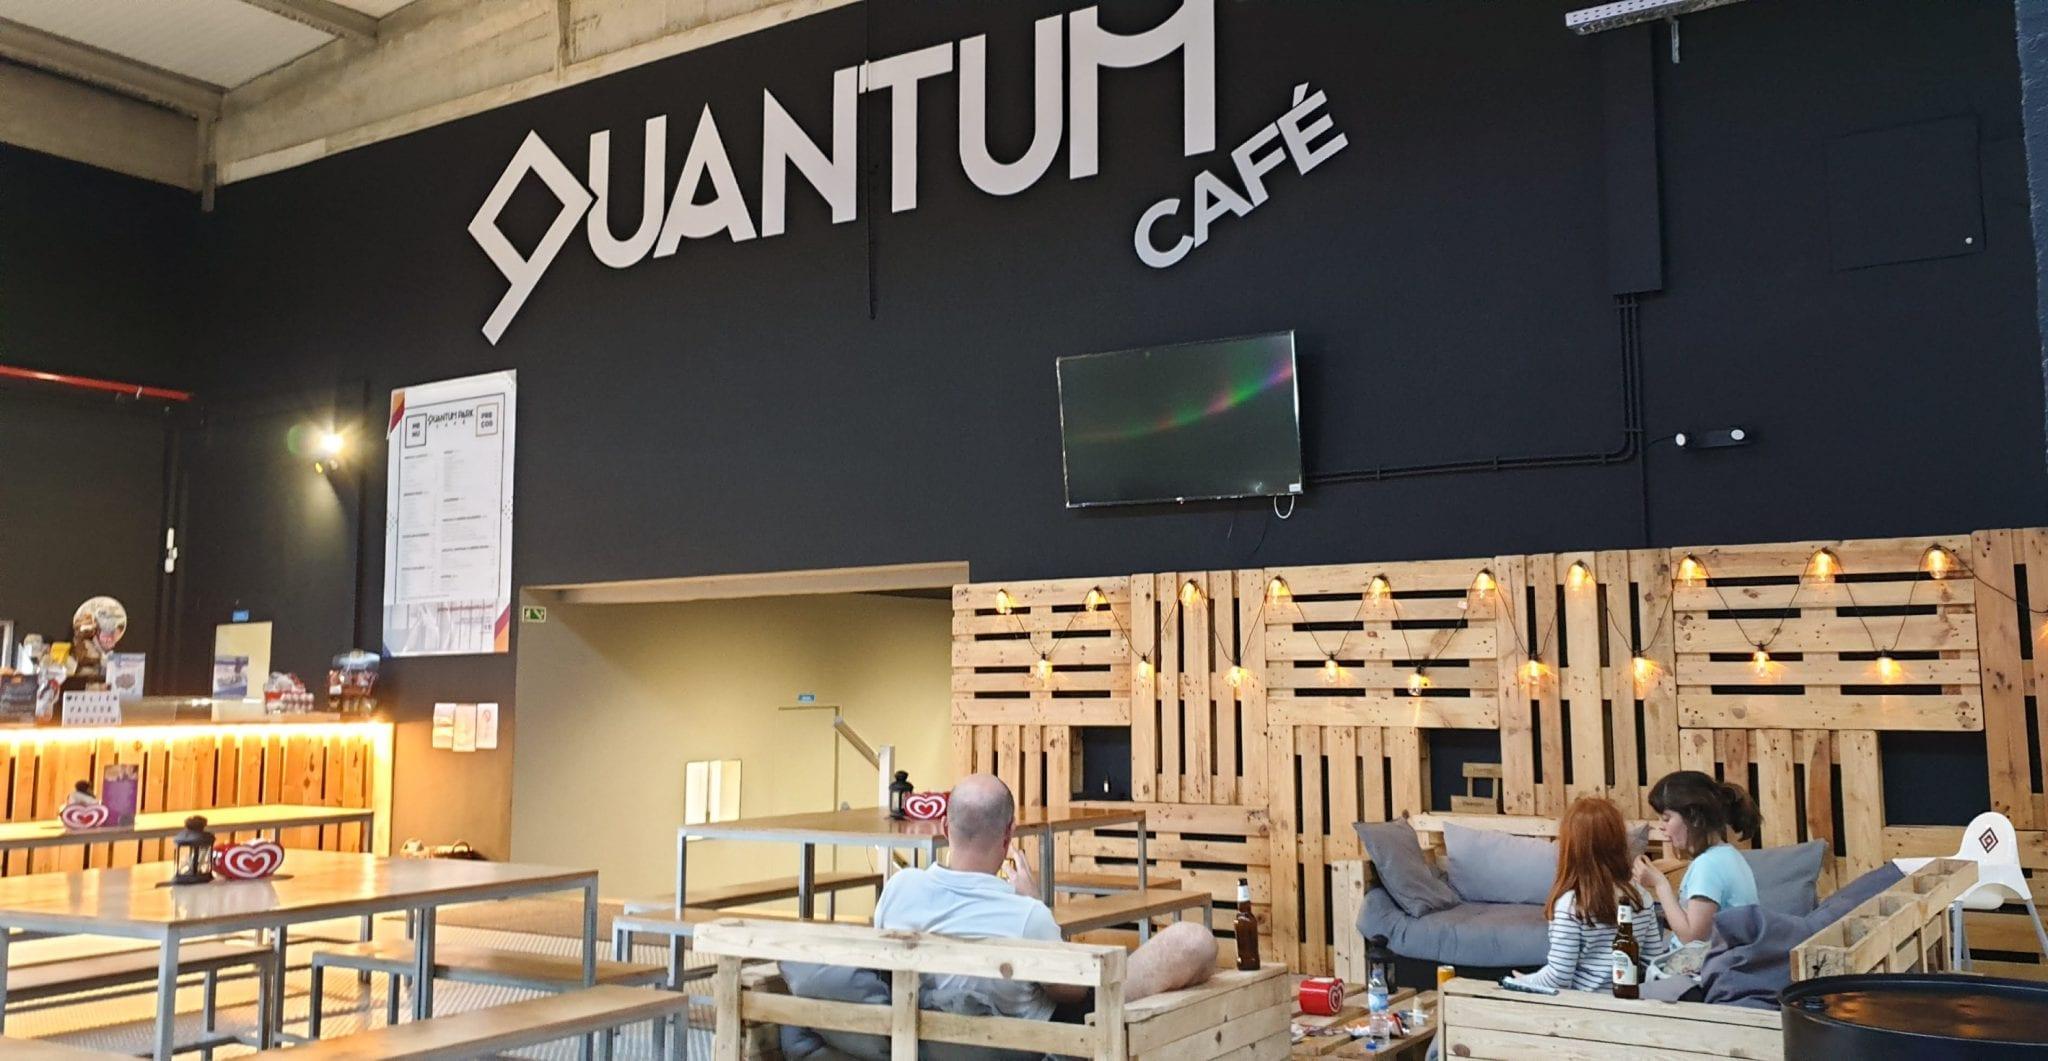 quantum park cafe